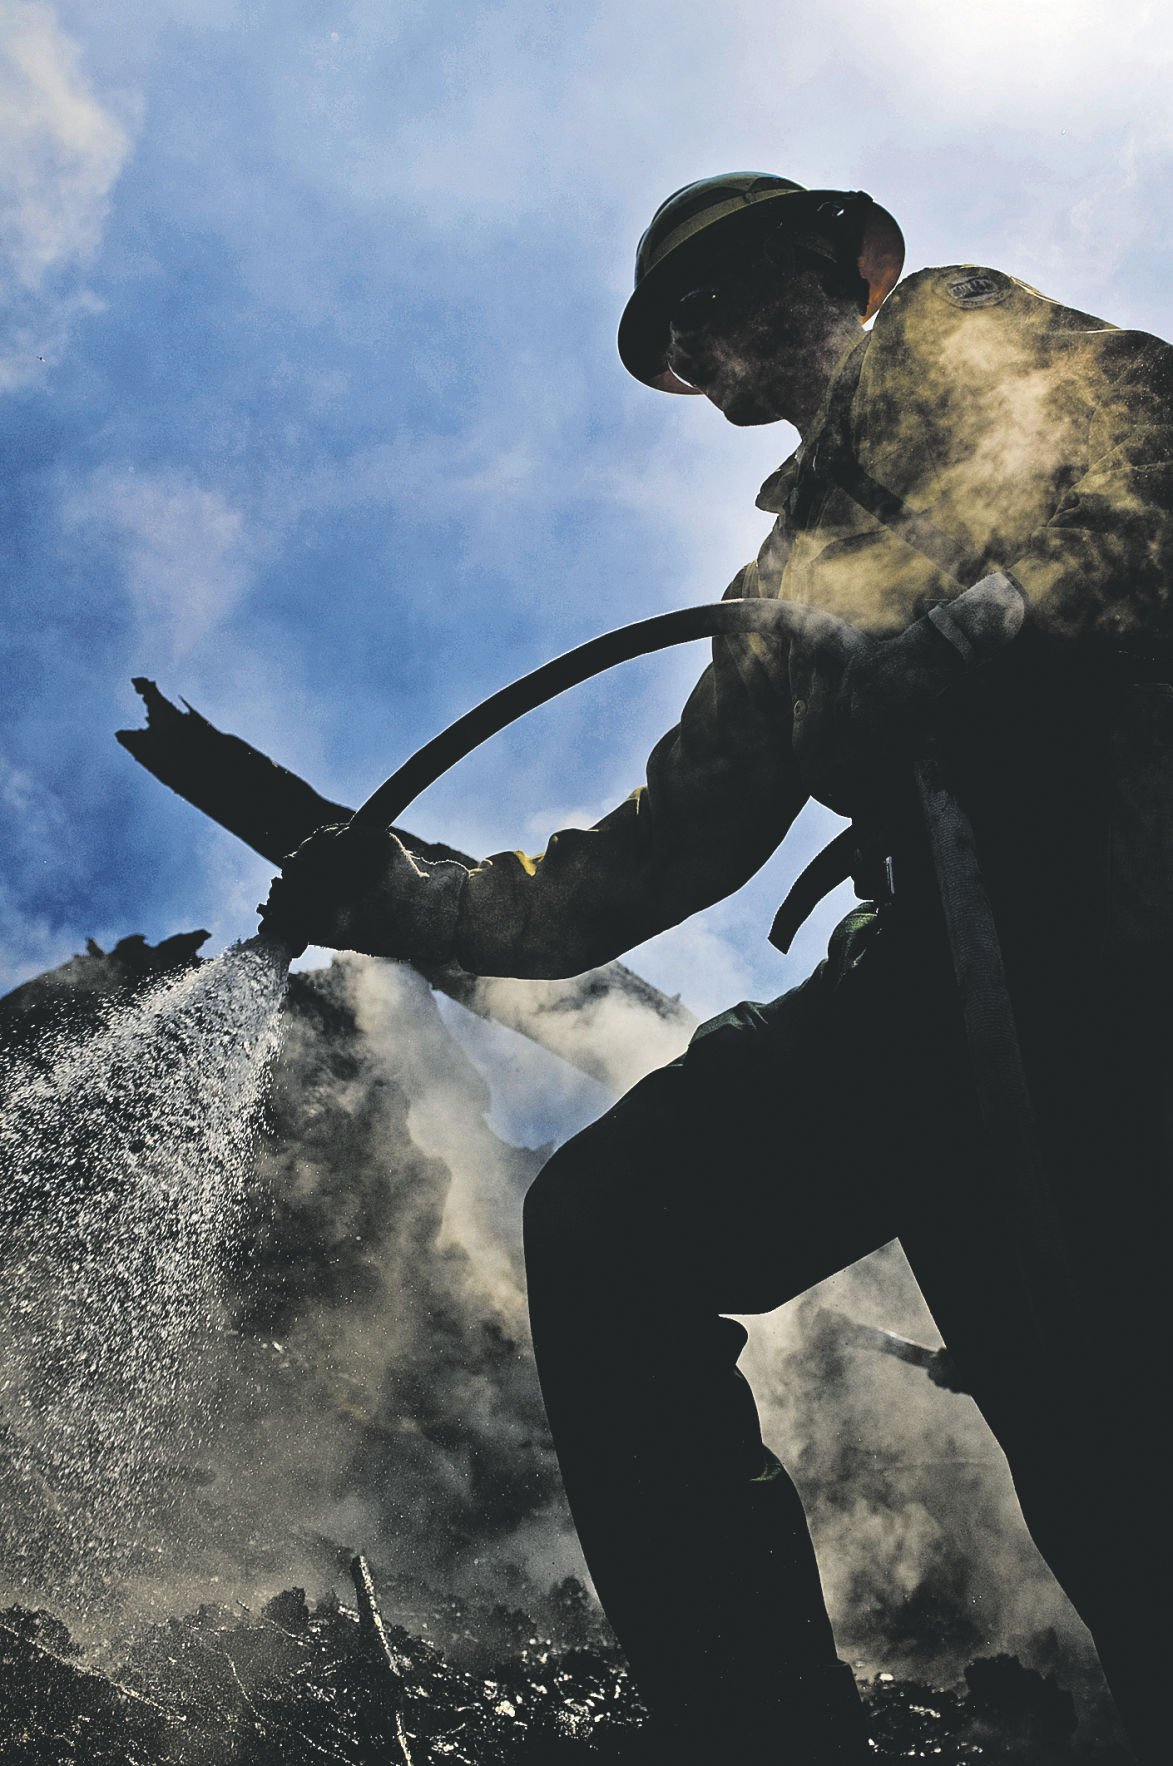 Oregon saw mild 2009 fire season